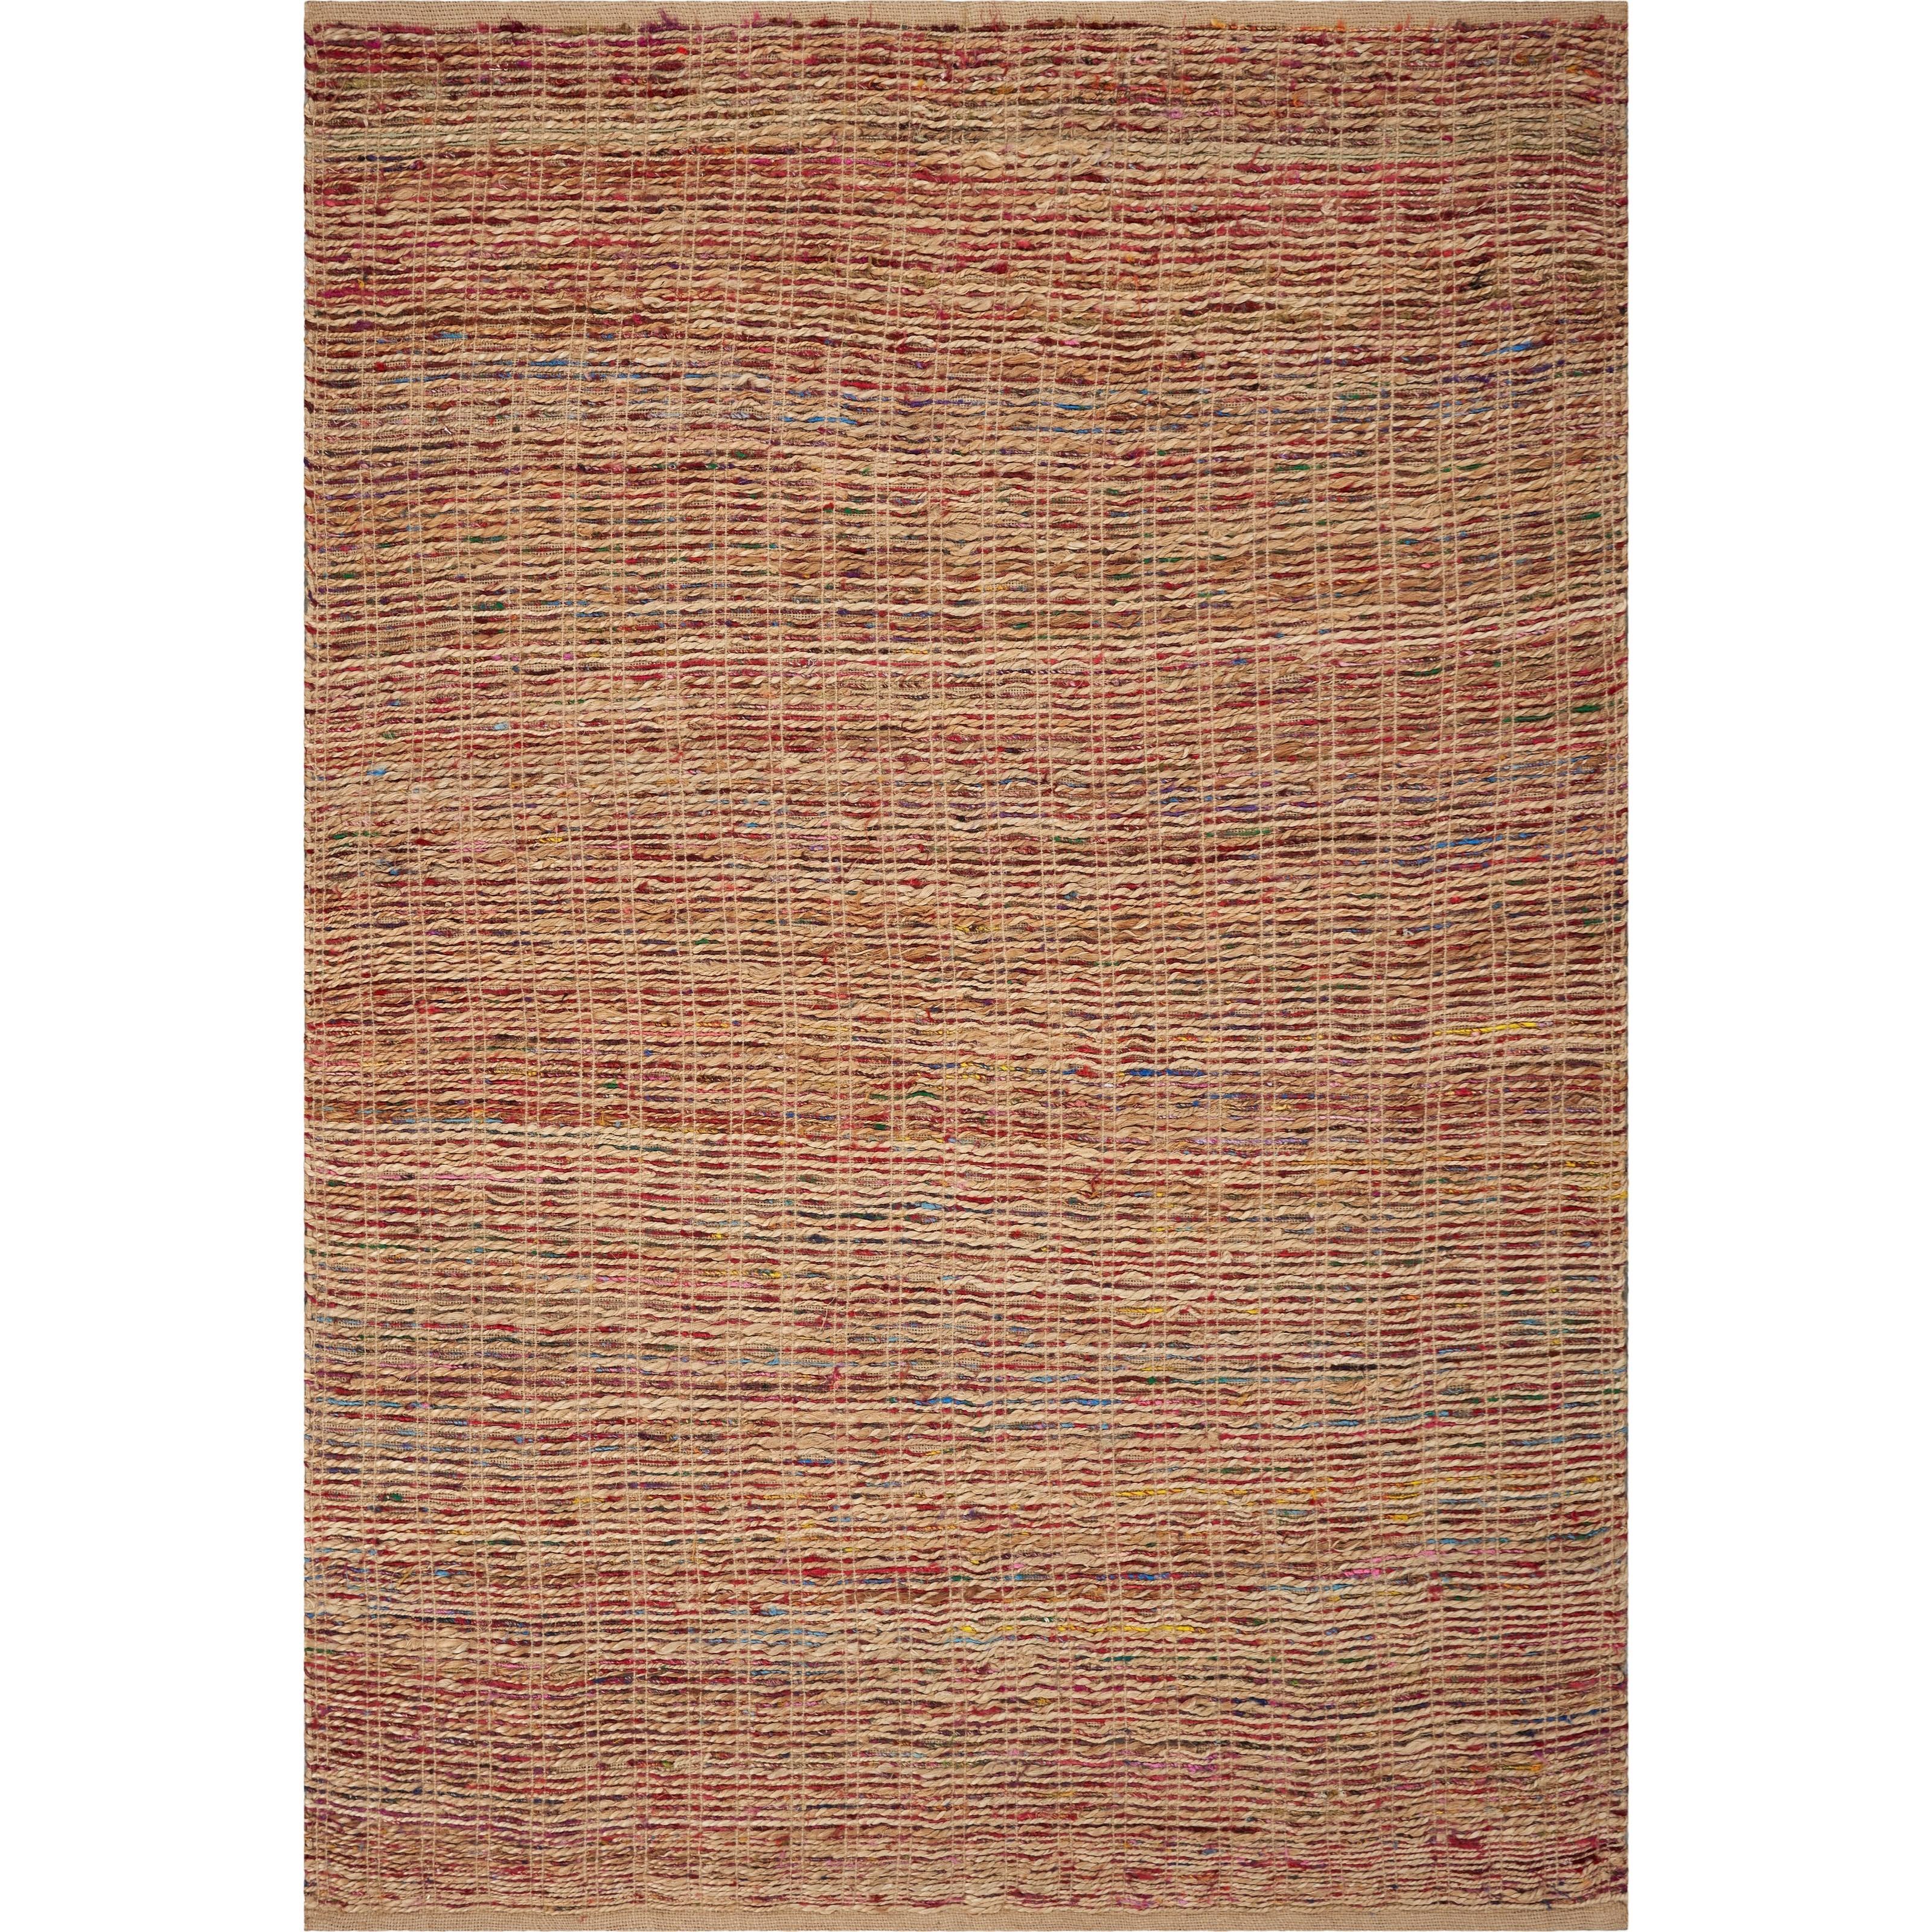 5' x 7' Multicolor Sands Rug